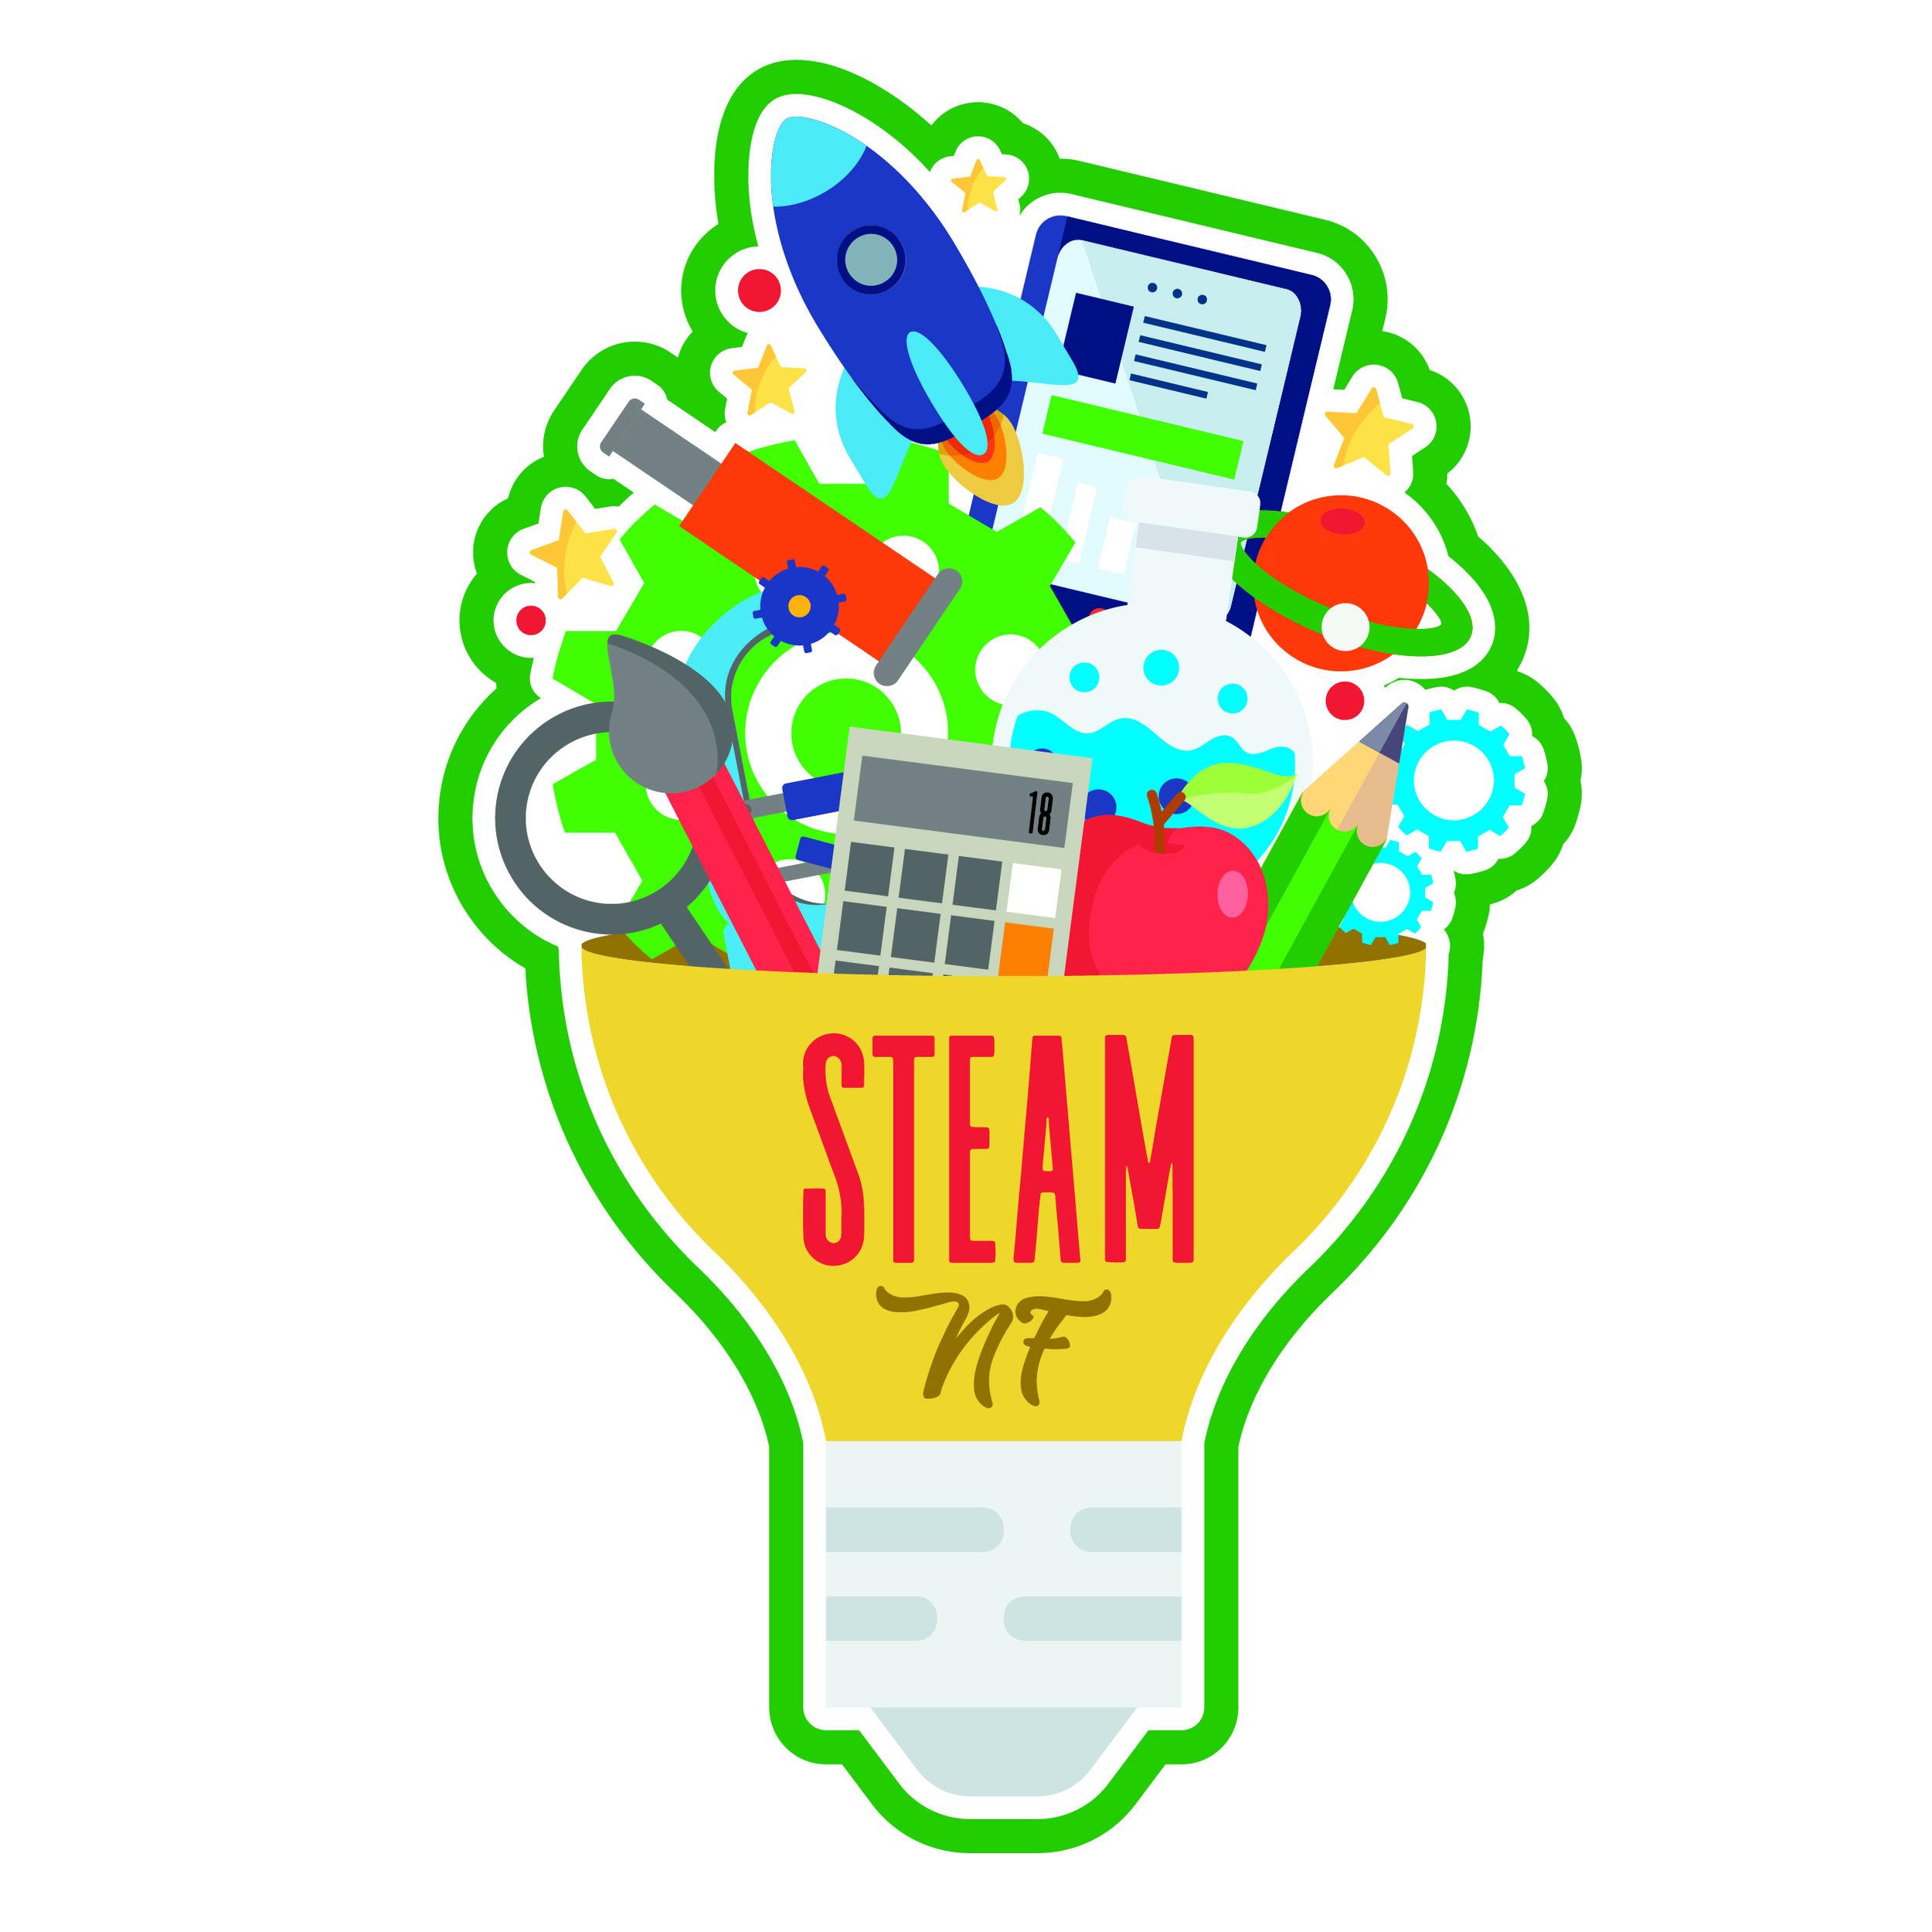 NFCD_STEAM NF_logo_070218-01.jpg